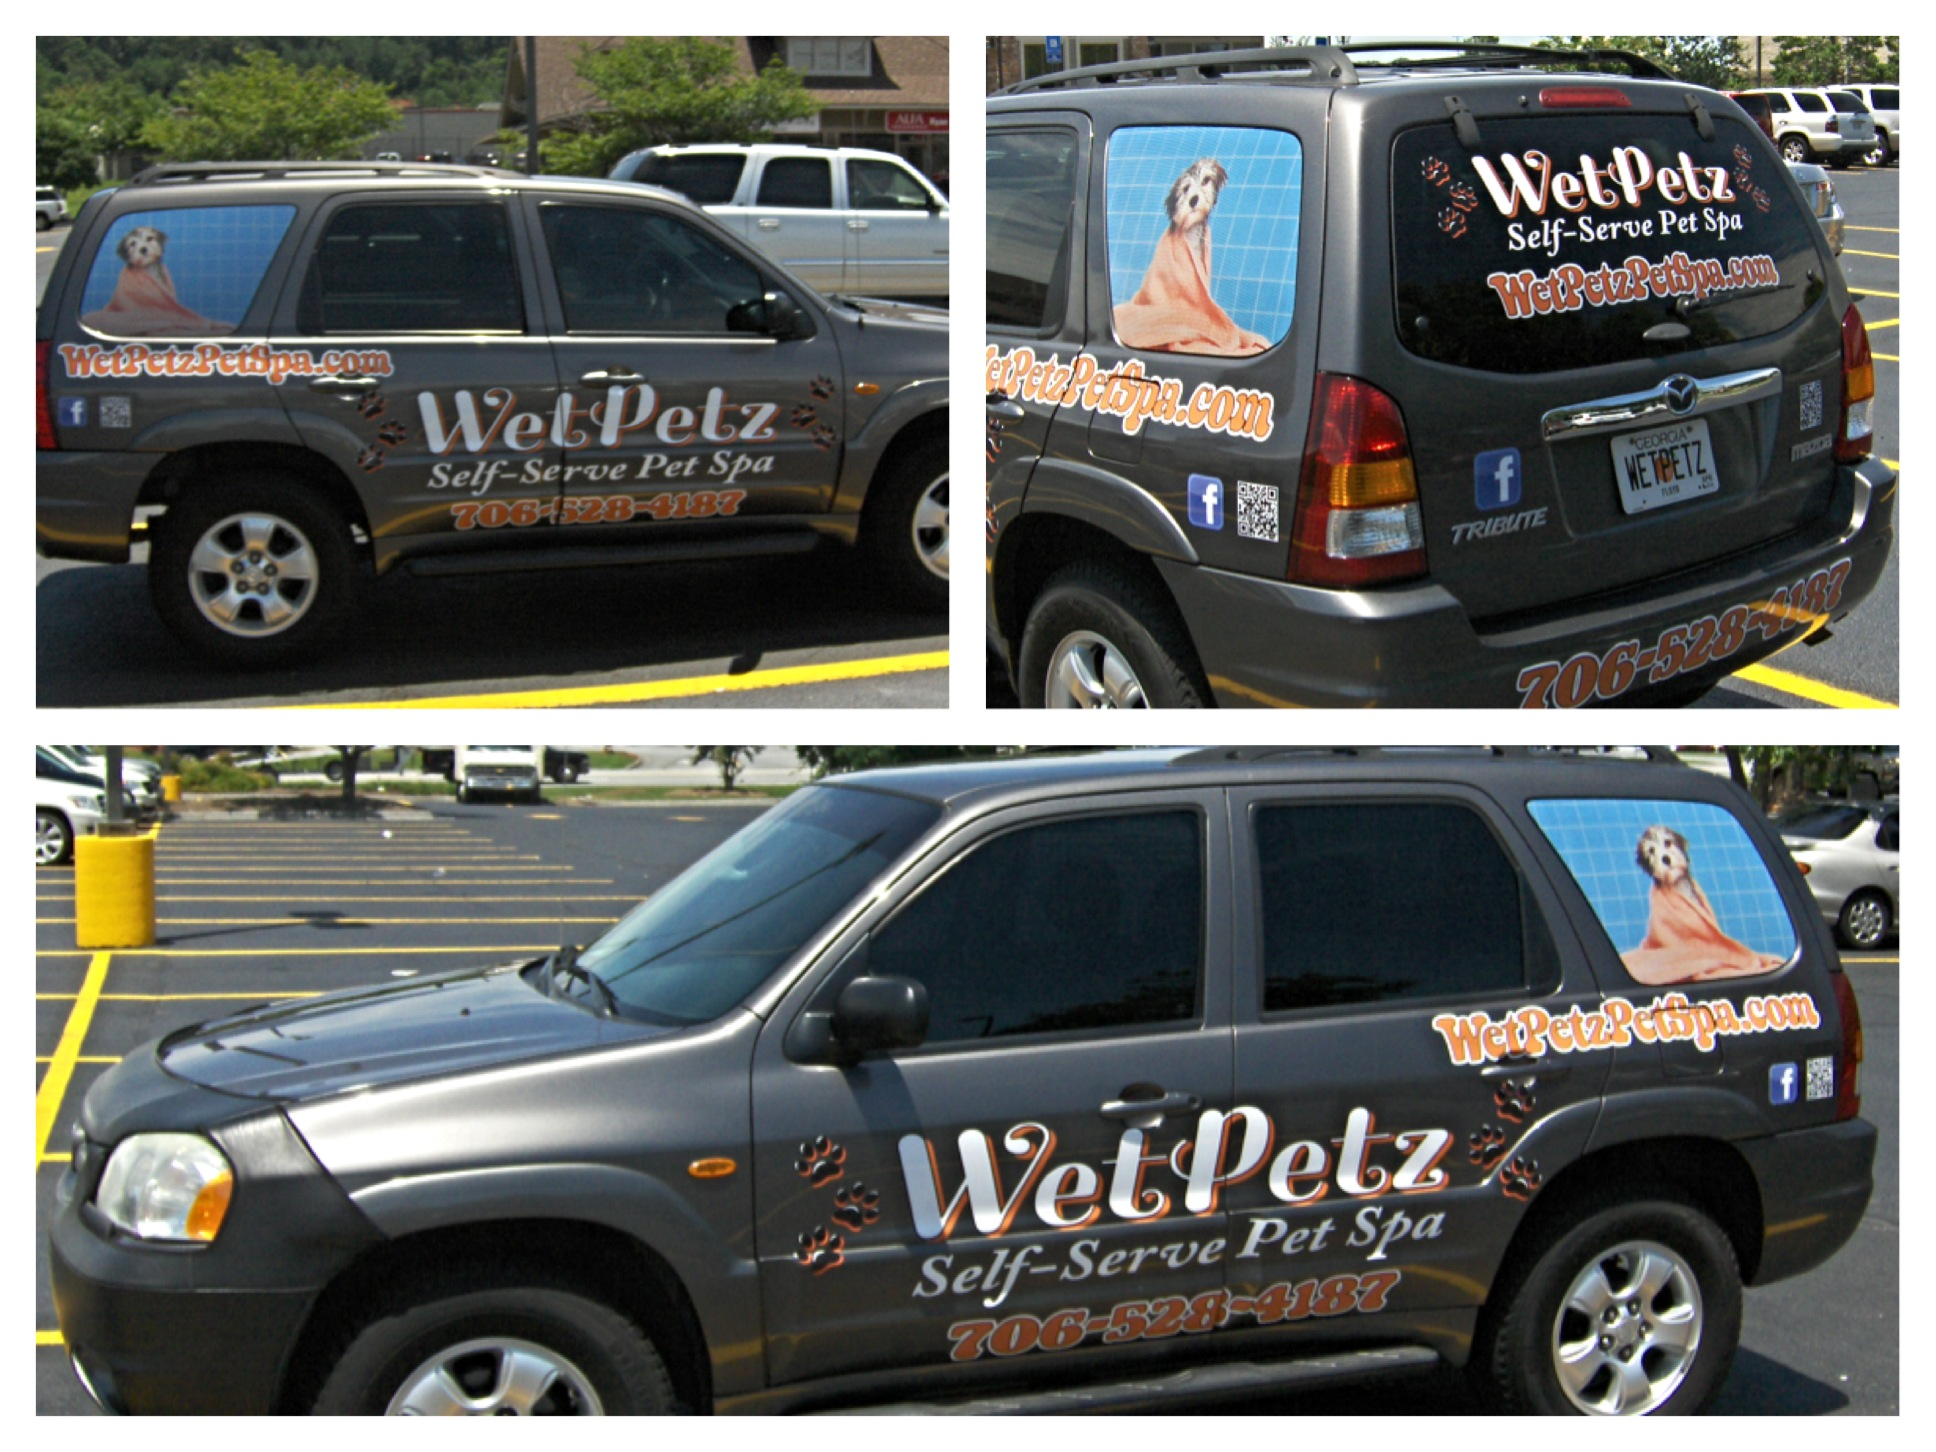 Vehicle-Graphics-Wet-Petz.jpg